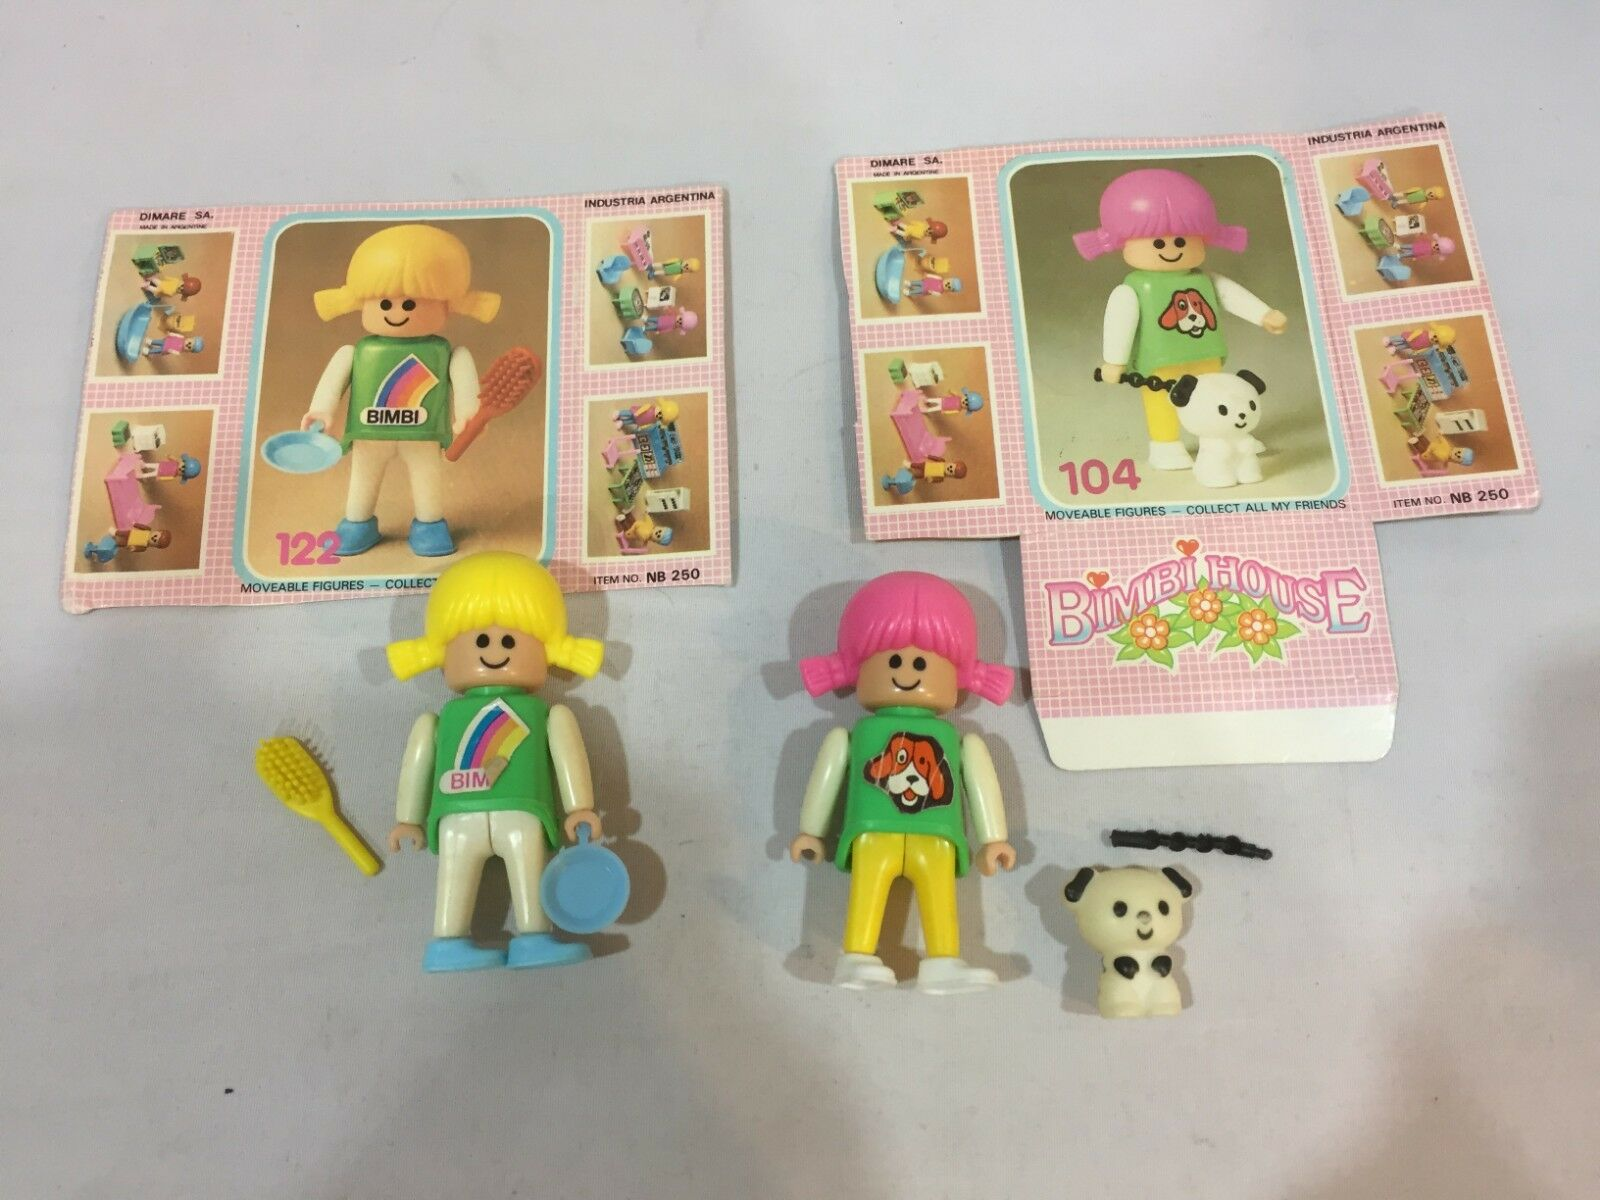 Rare Vintage Bimbi House Pinypon Toy Figures   122 &  104 Complete